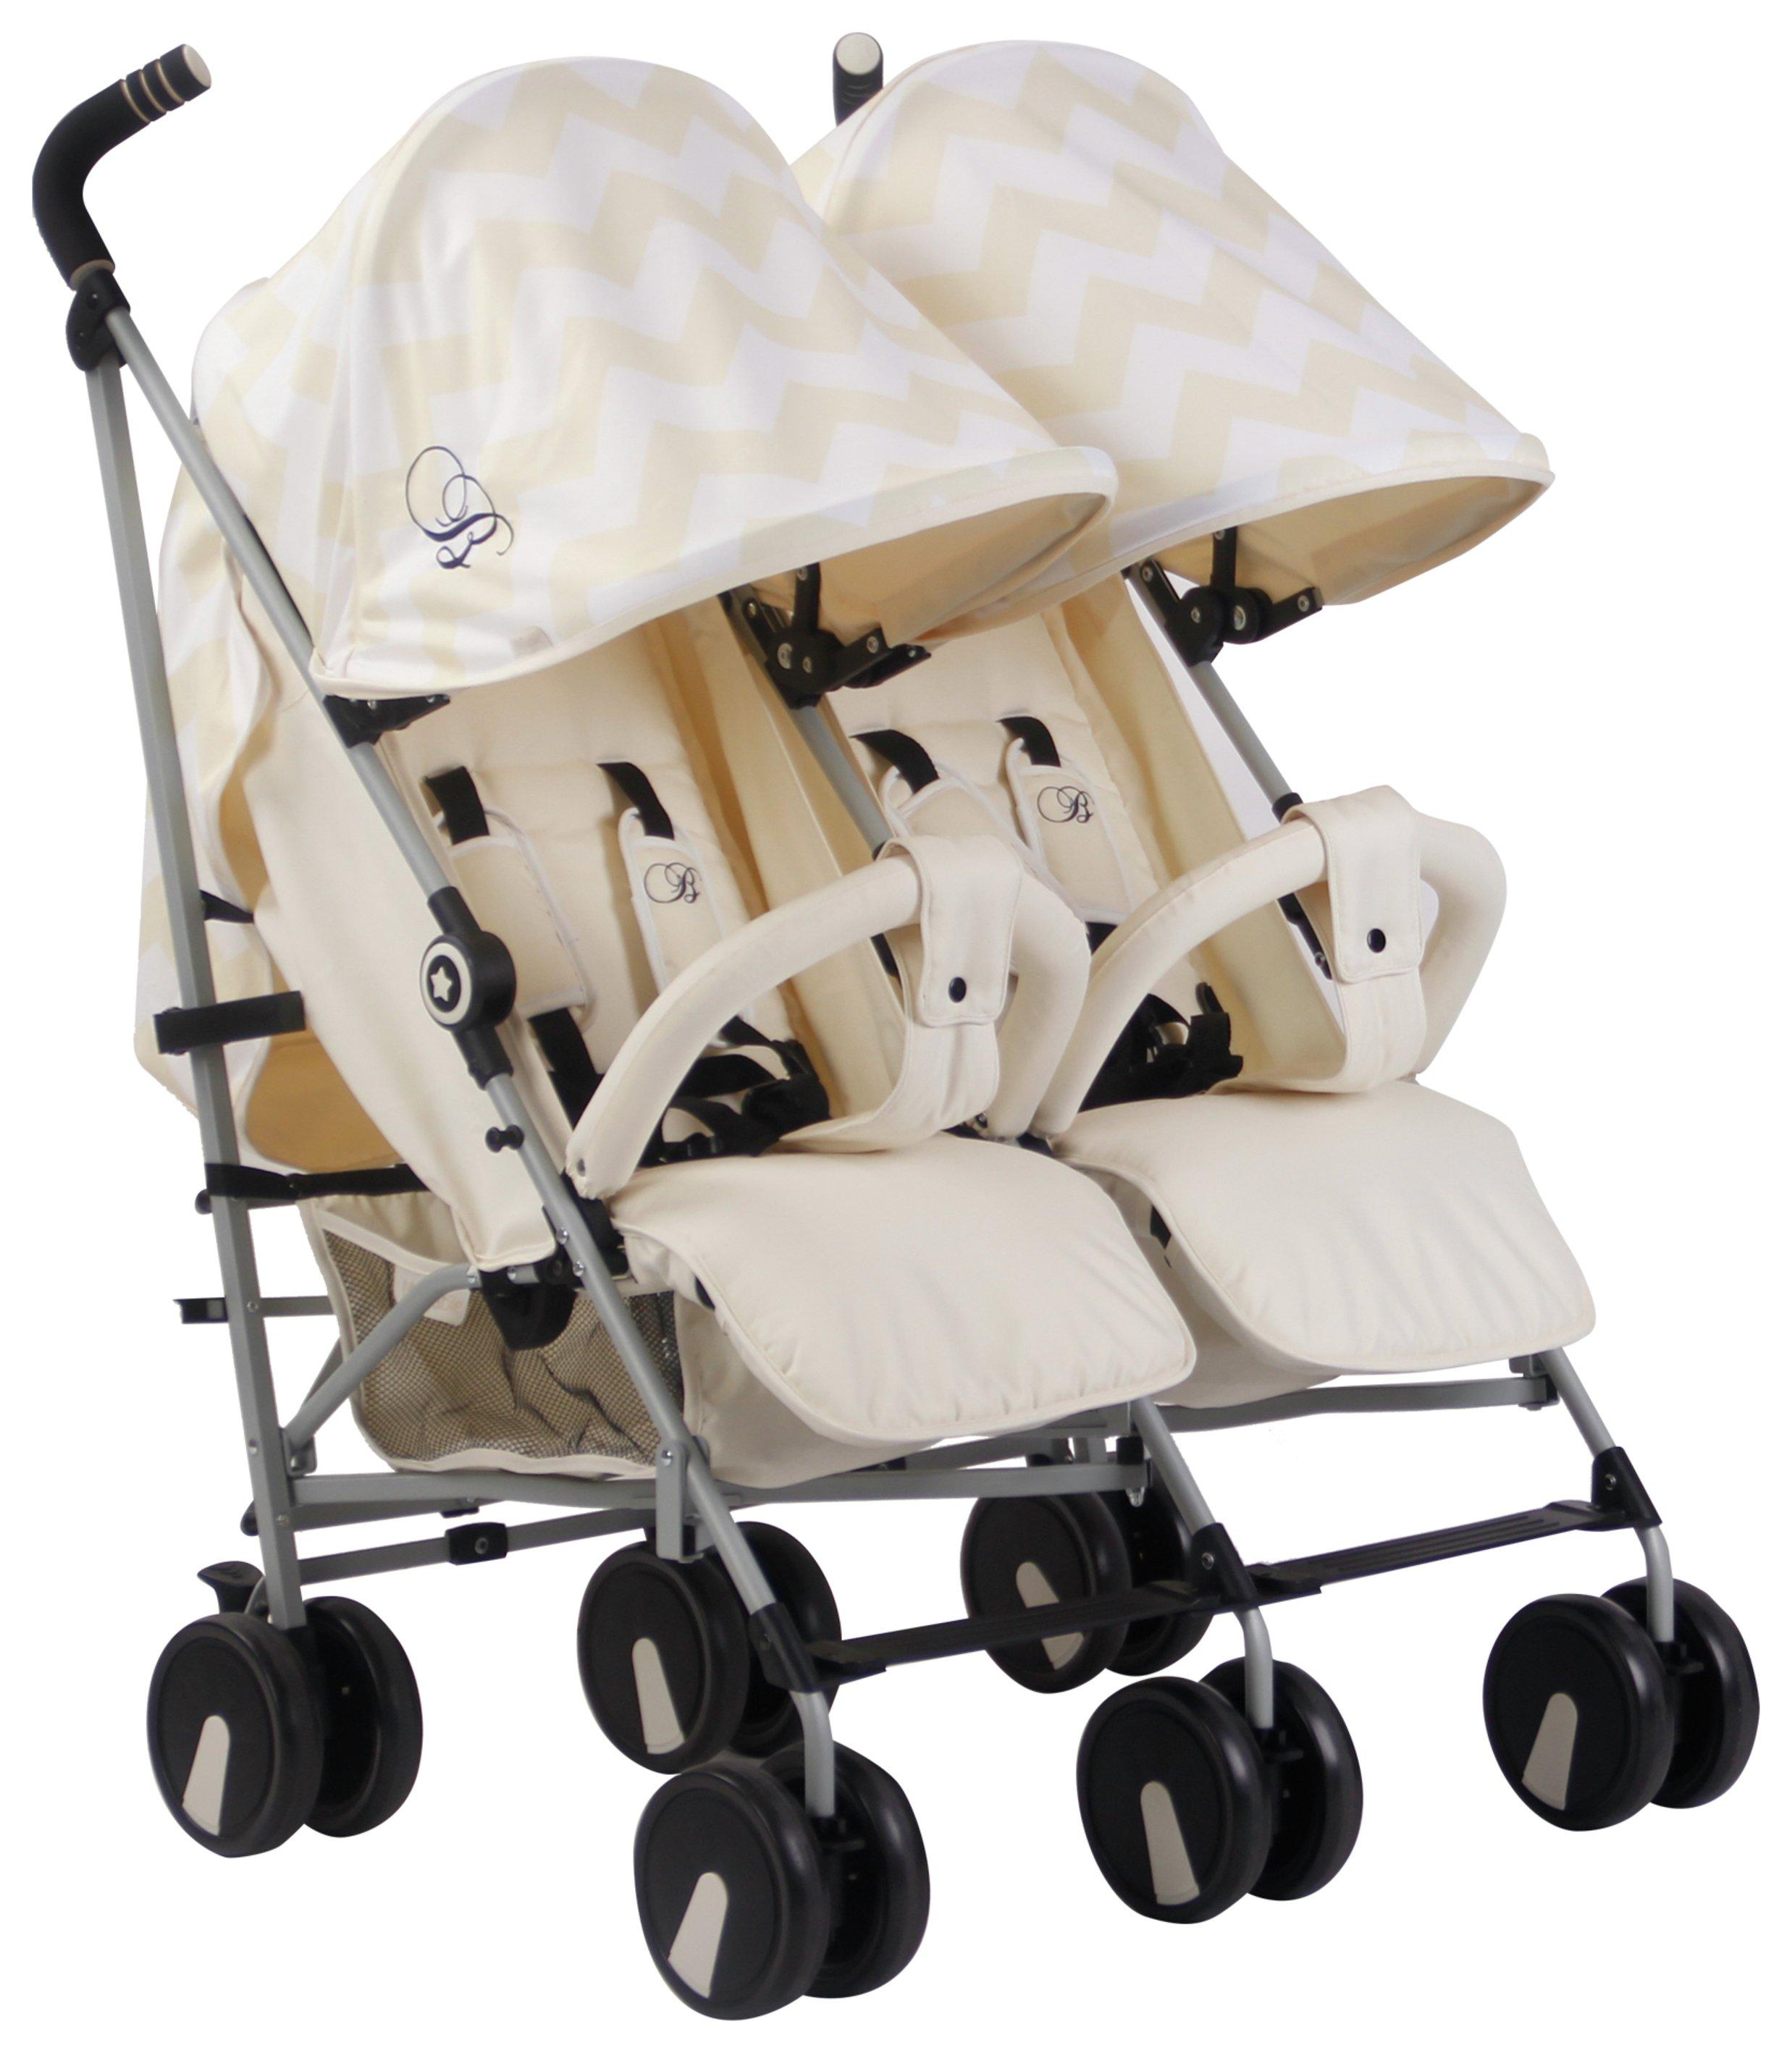 My Babiie Billie Faiers MB22 Chevron Twin Pushchair - Cream